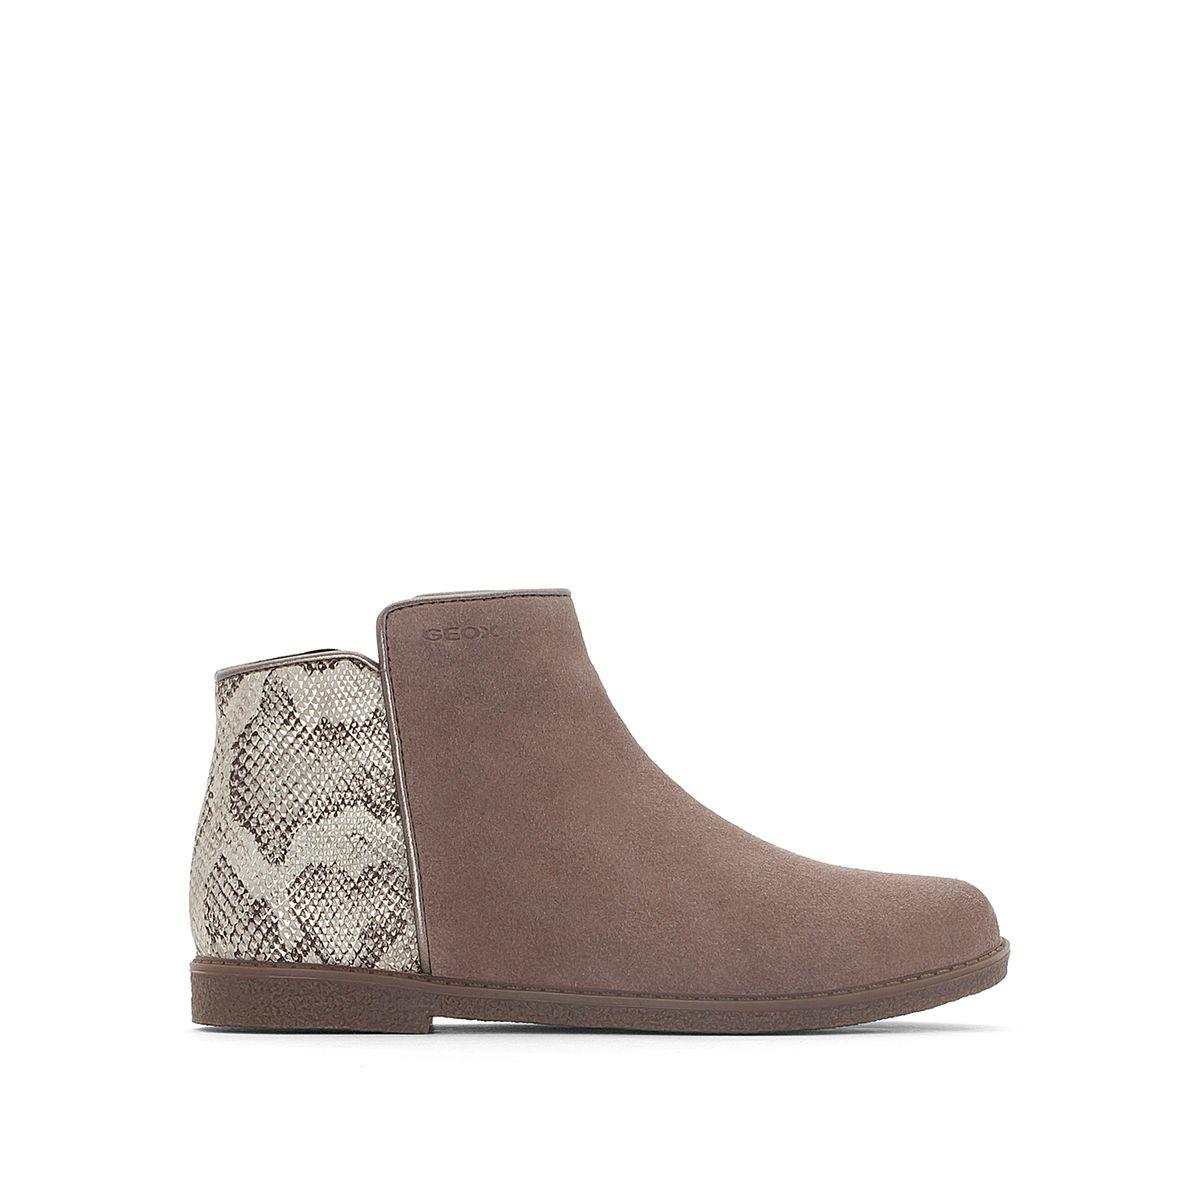 Boots détail irisé Shawntel